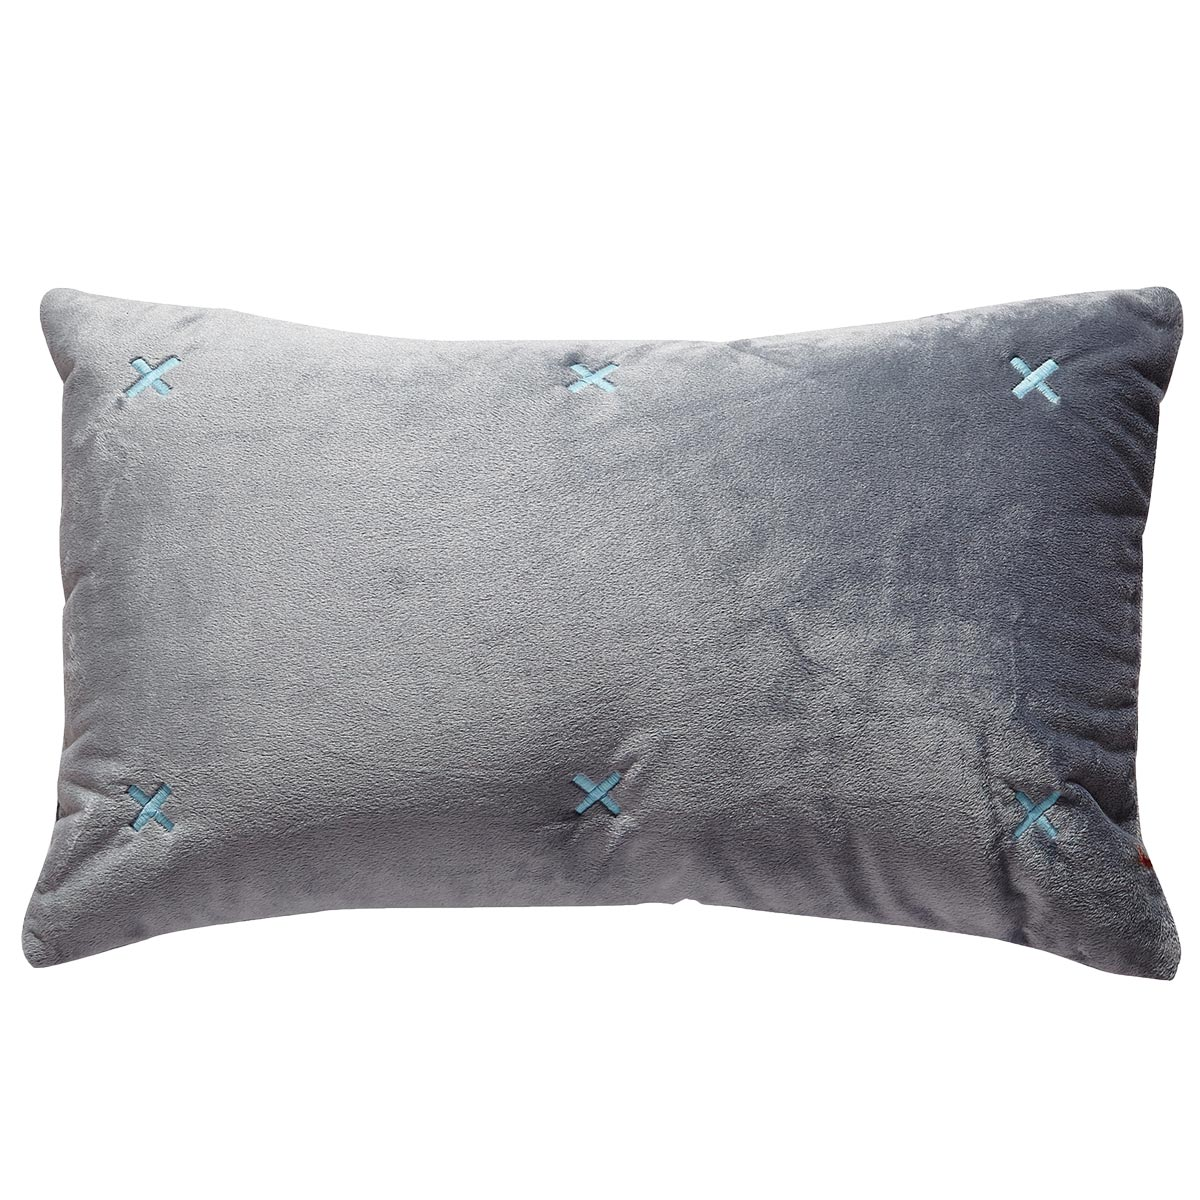 coussin brod petites croix galet sable homemaison vente en ligne coussins standards. Black Bedroom Furniture Sets. Home Design Ideas